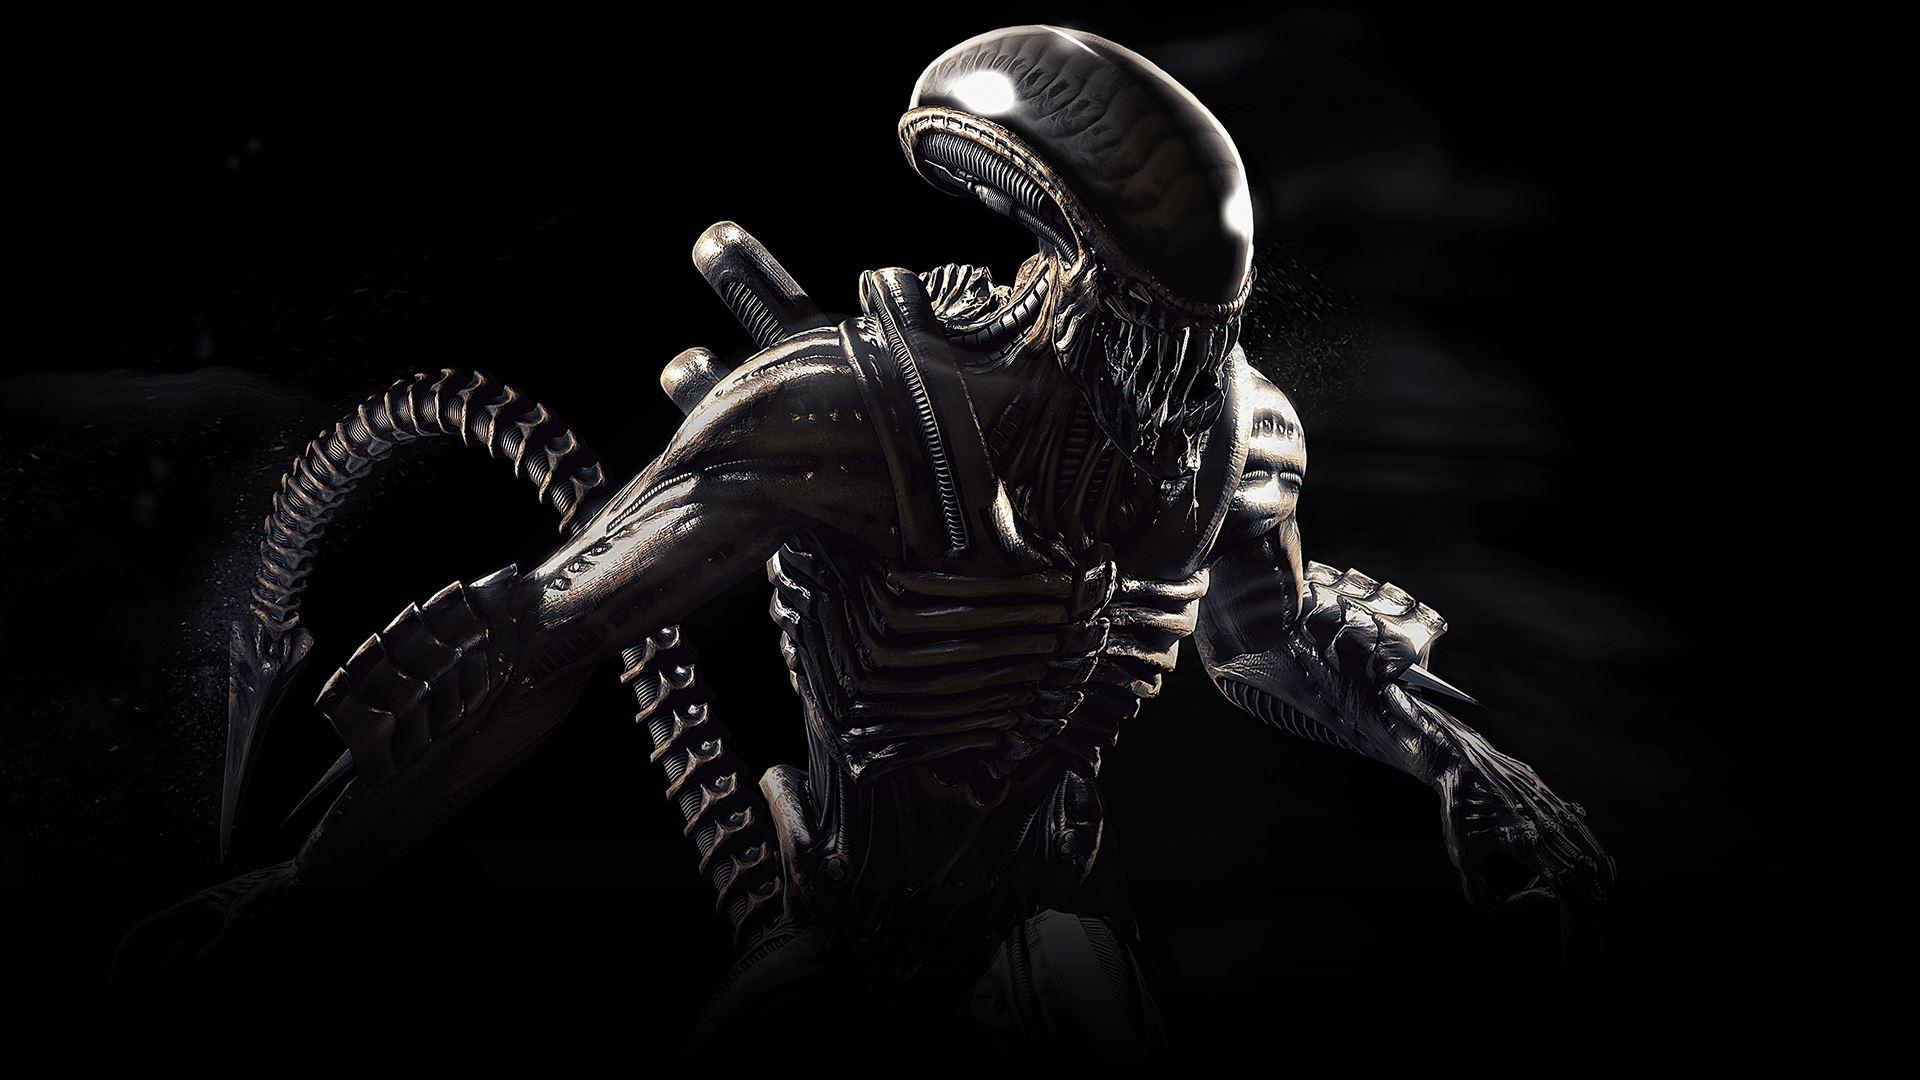 Wallpaper Xenomorph Mortal Kombat X Alien Movie 1920x1080